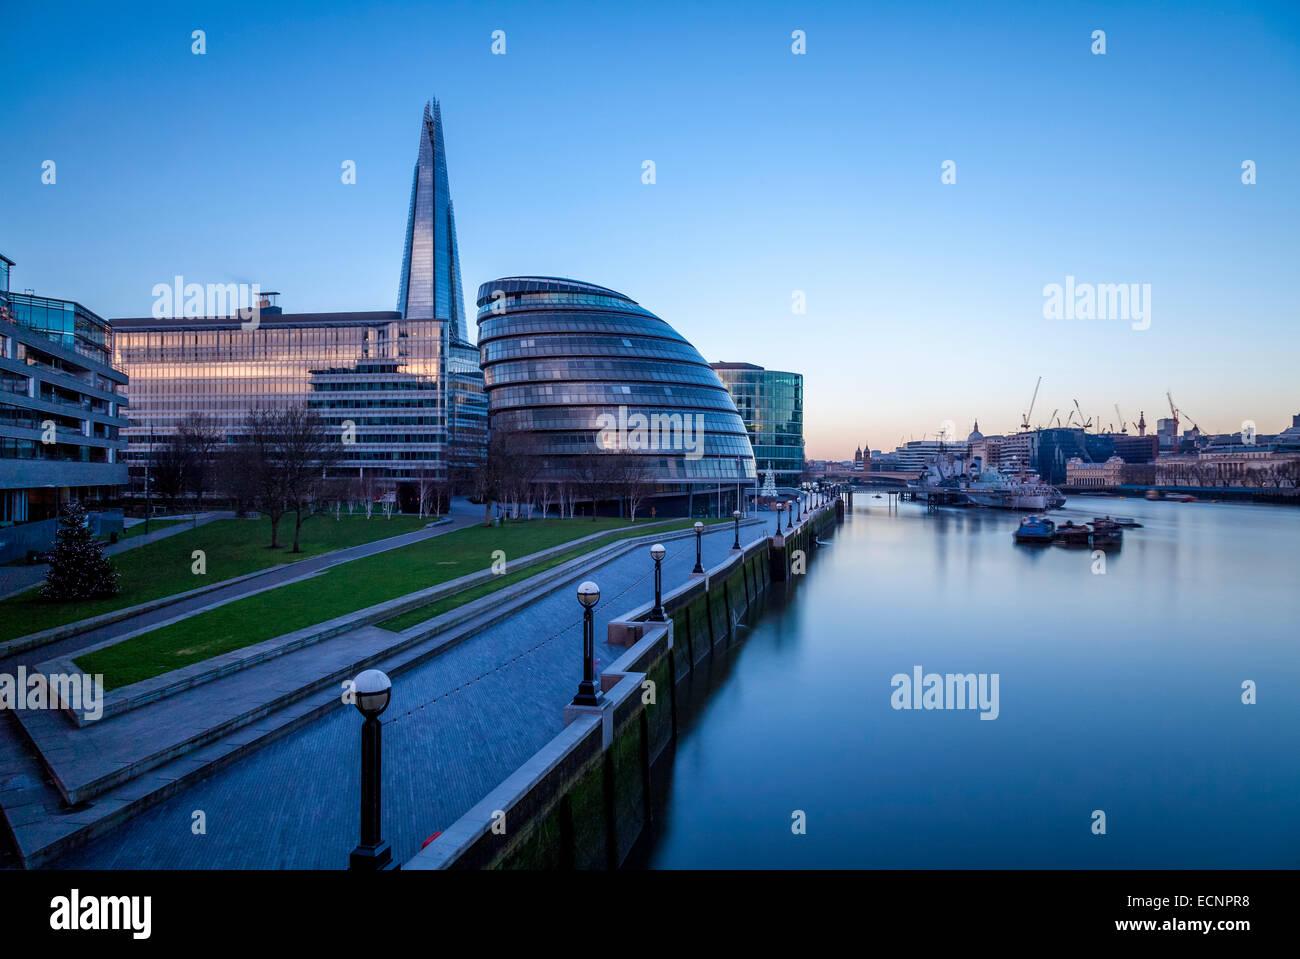 City Hall, The Shard and River Thames, London, England - Stock Image